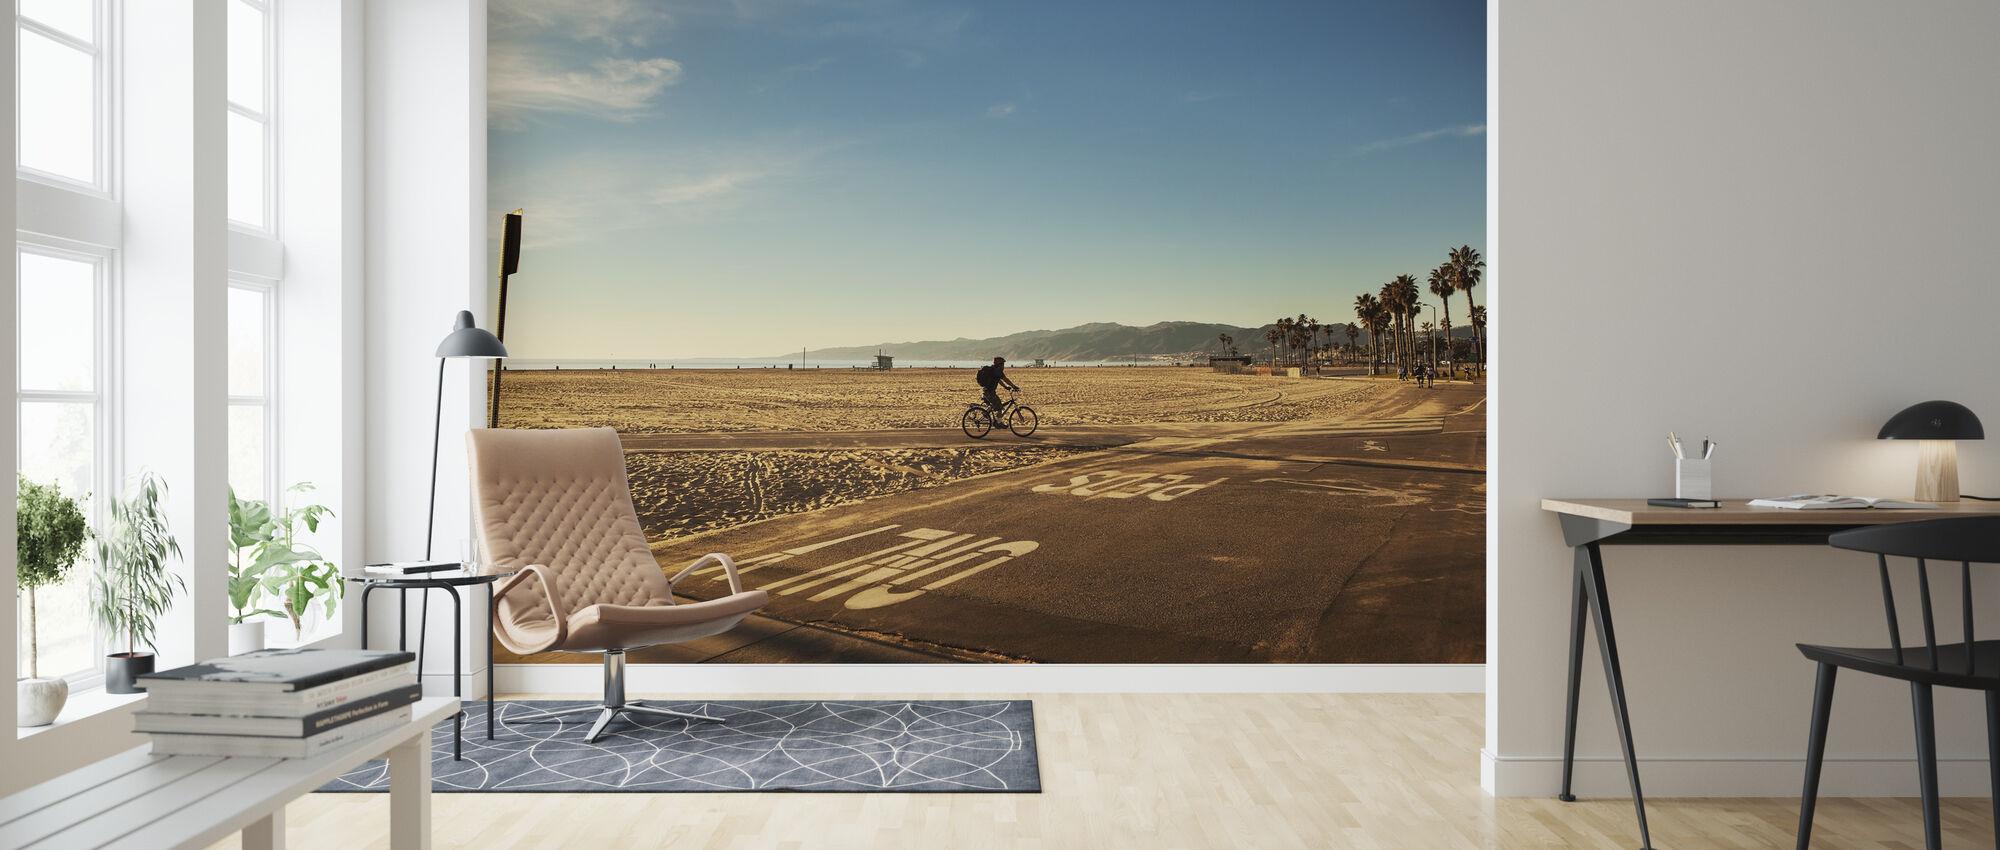 Venice Beach, Los Angeles - Wallpaper - Living Room